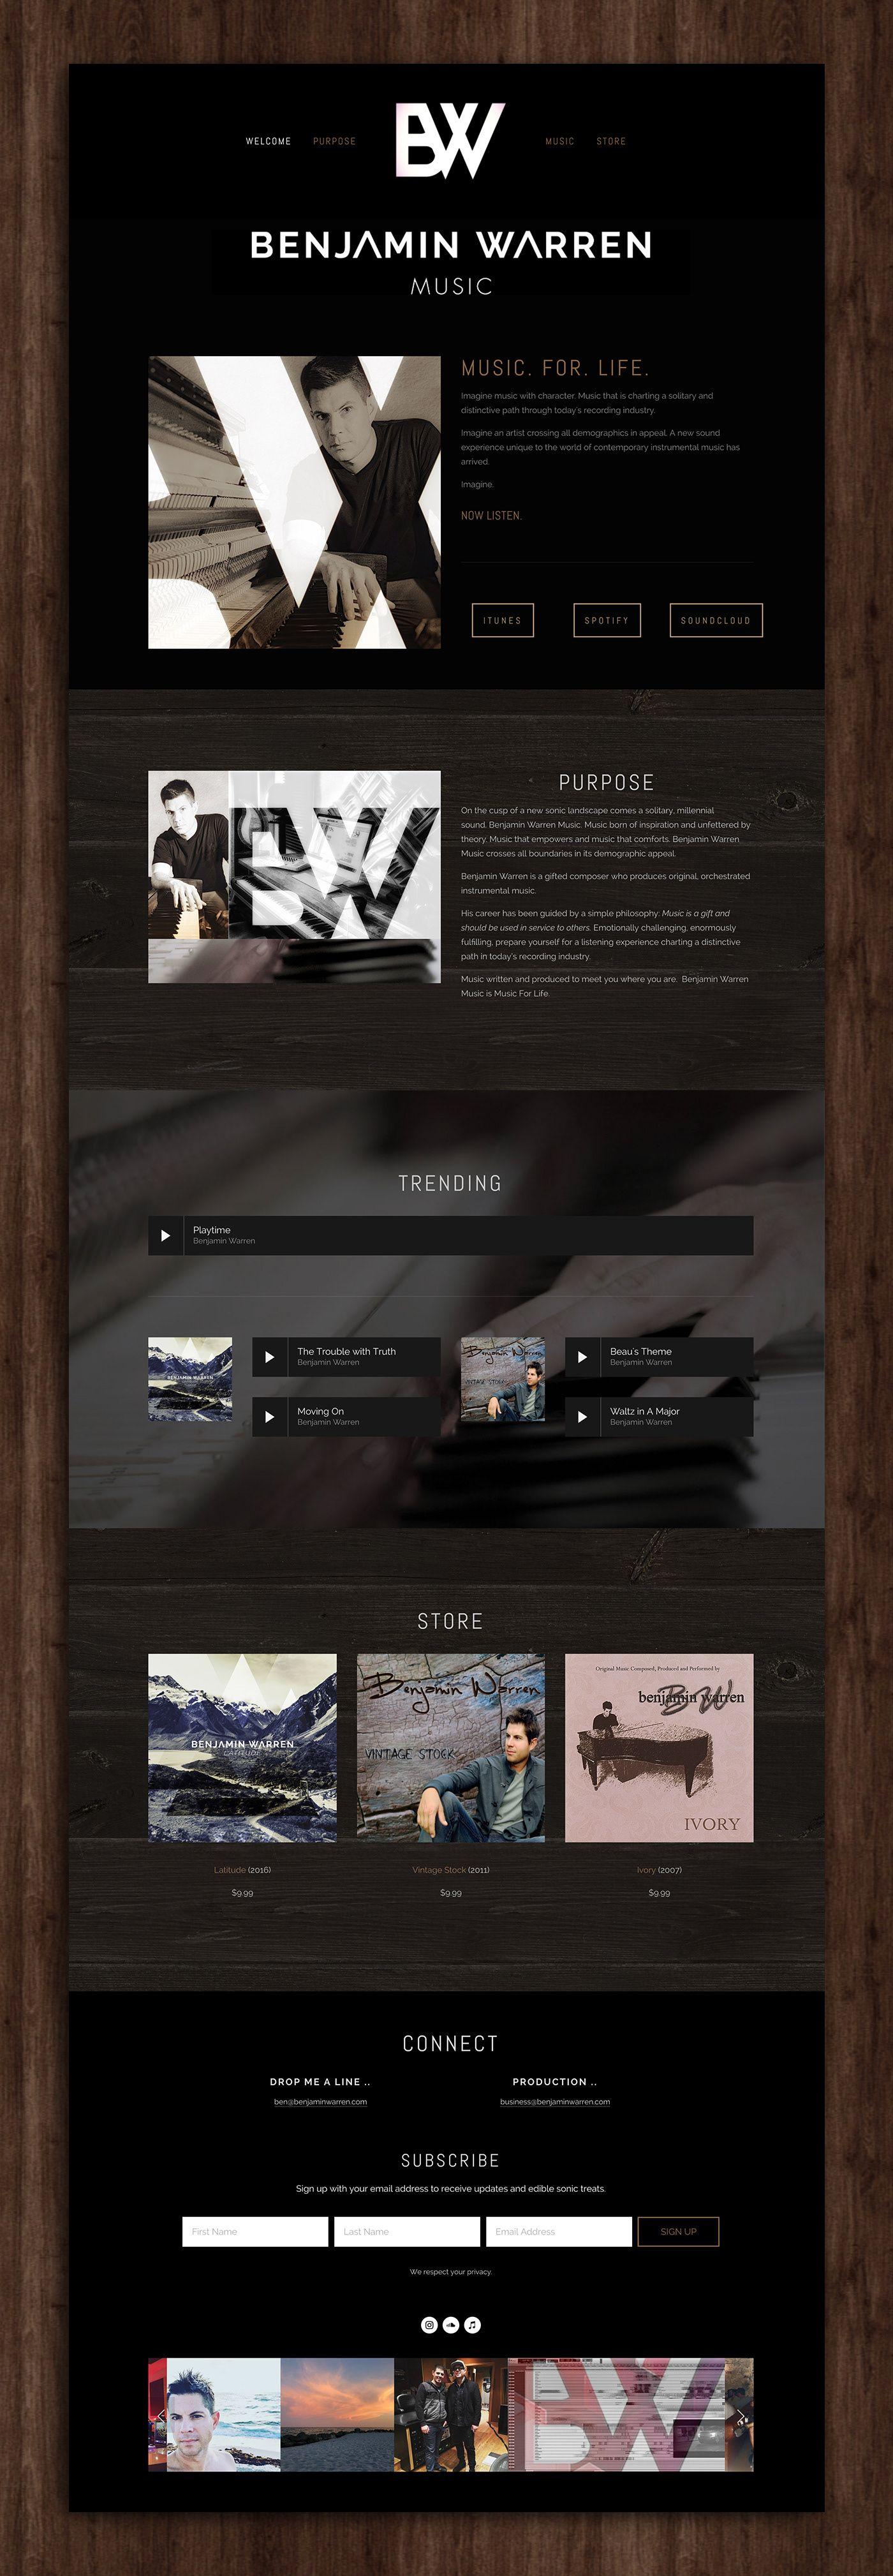 Benjamin Warren Music On Behance Website Design For Musician Musician Website Website Design Web Design Inspiration